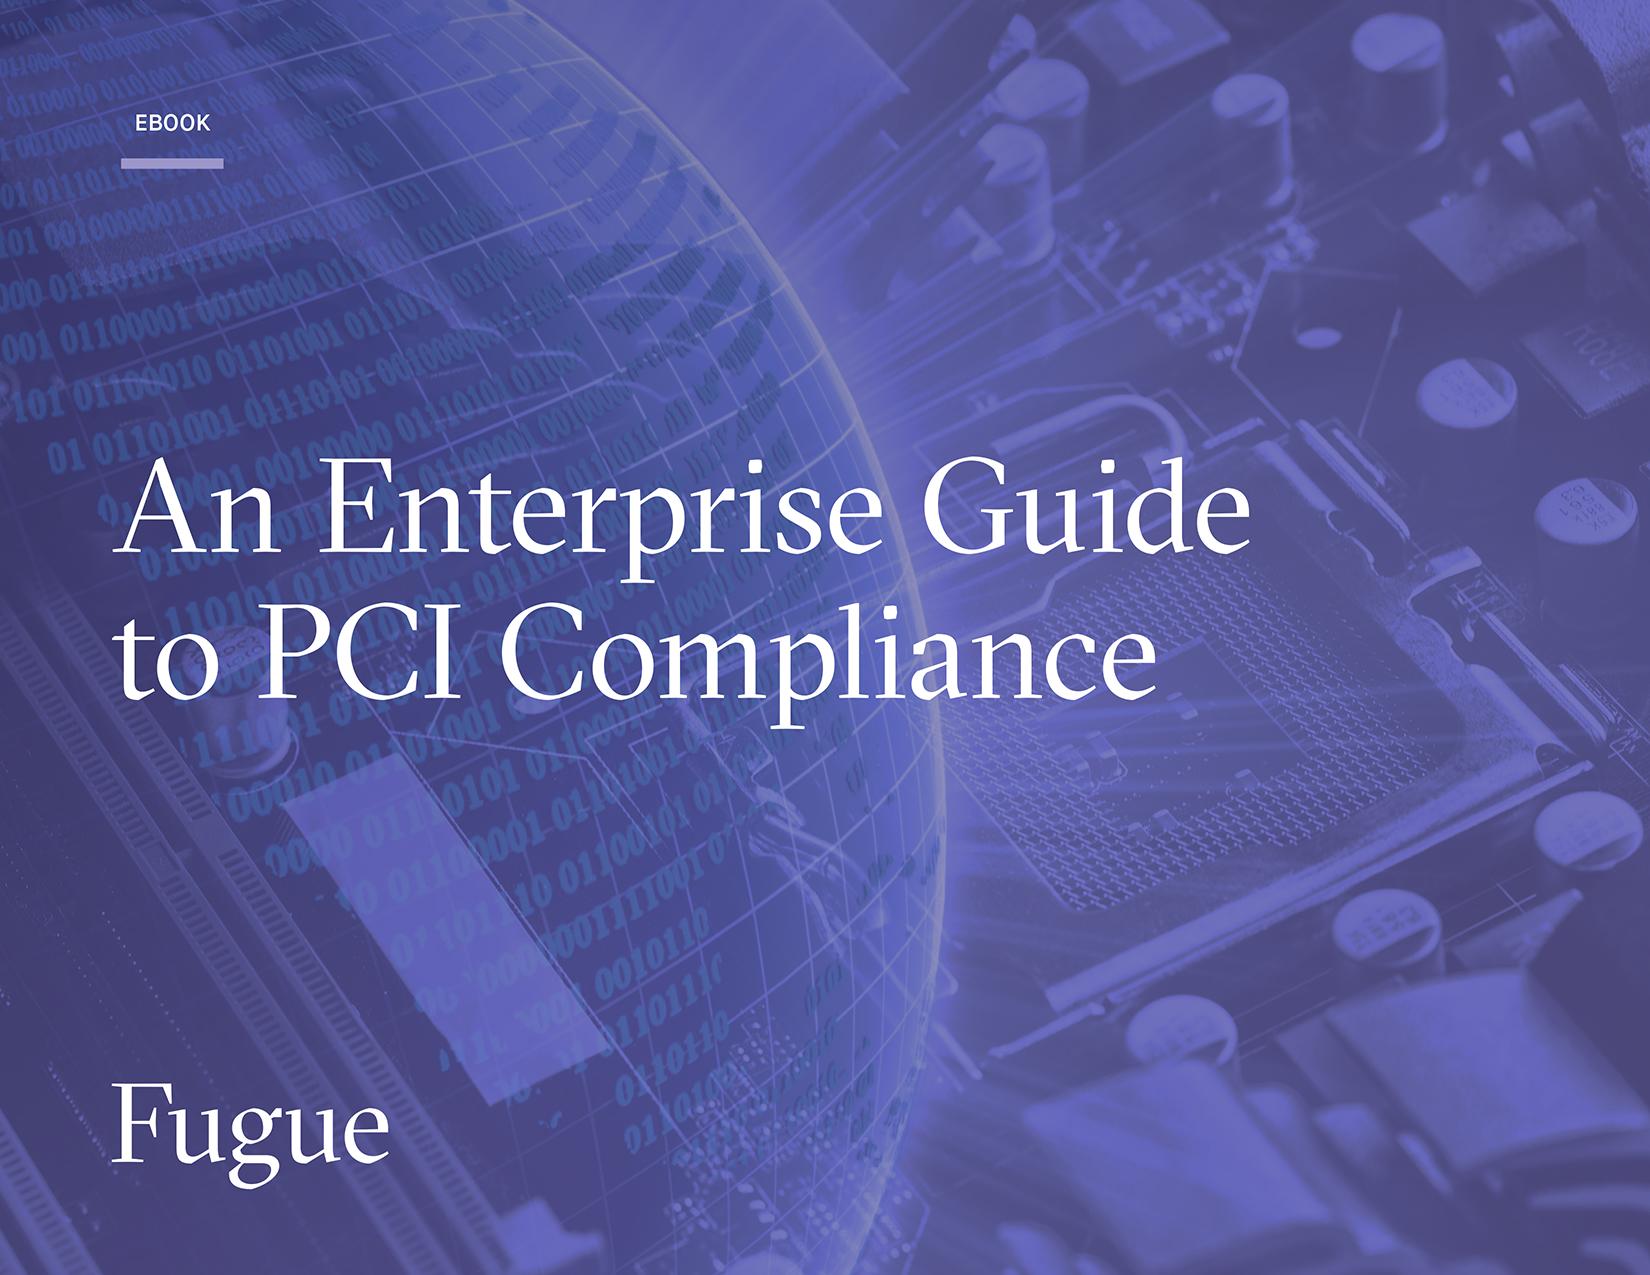 enterprise-guide-to-pci-compliance